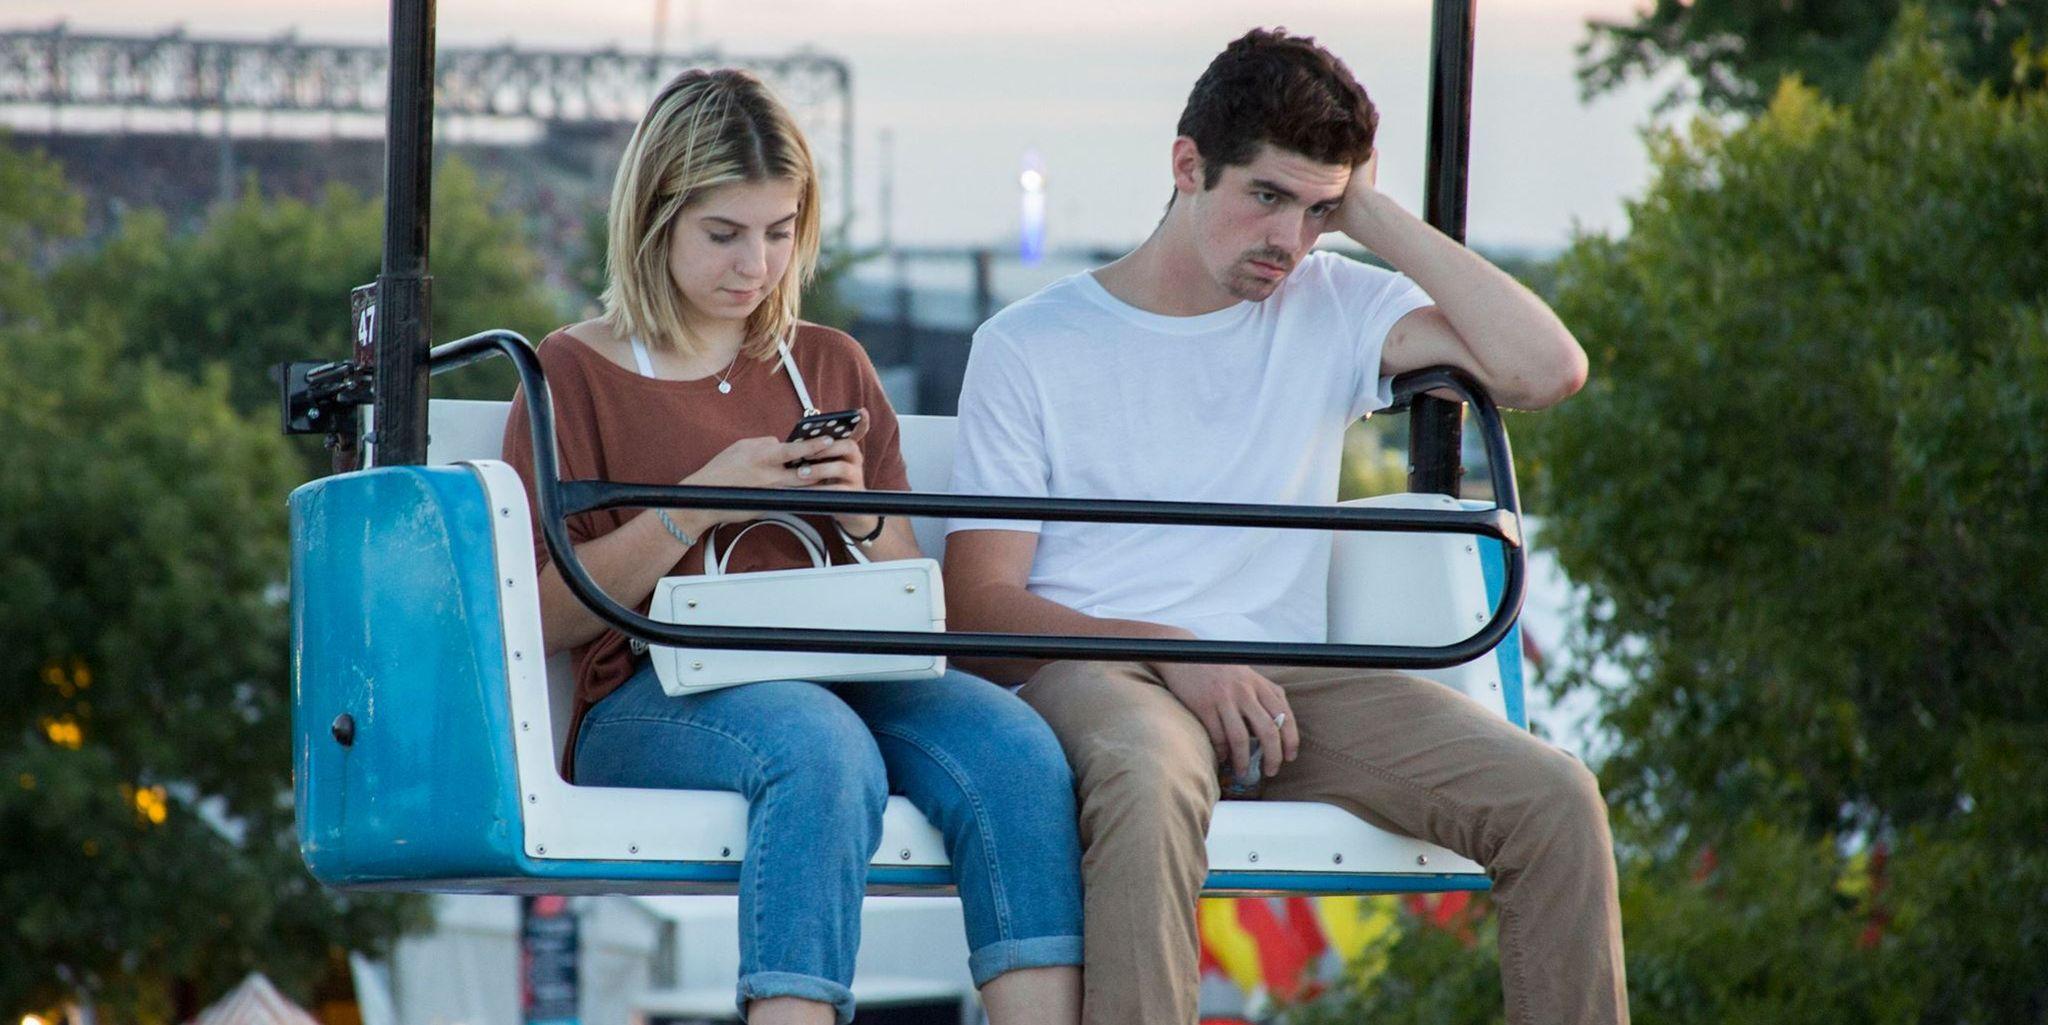 bored couple on ferris wheel